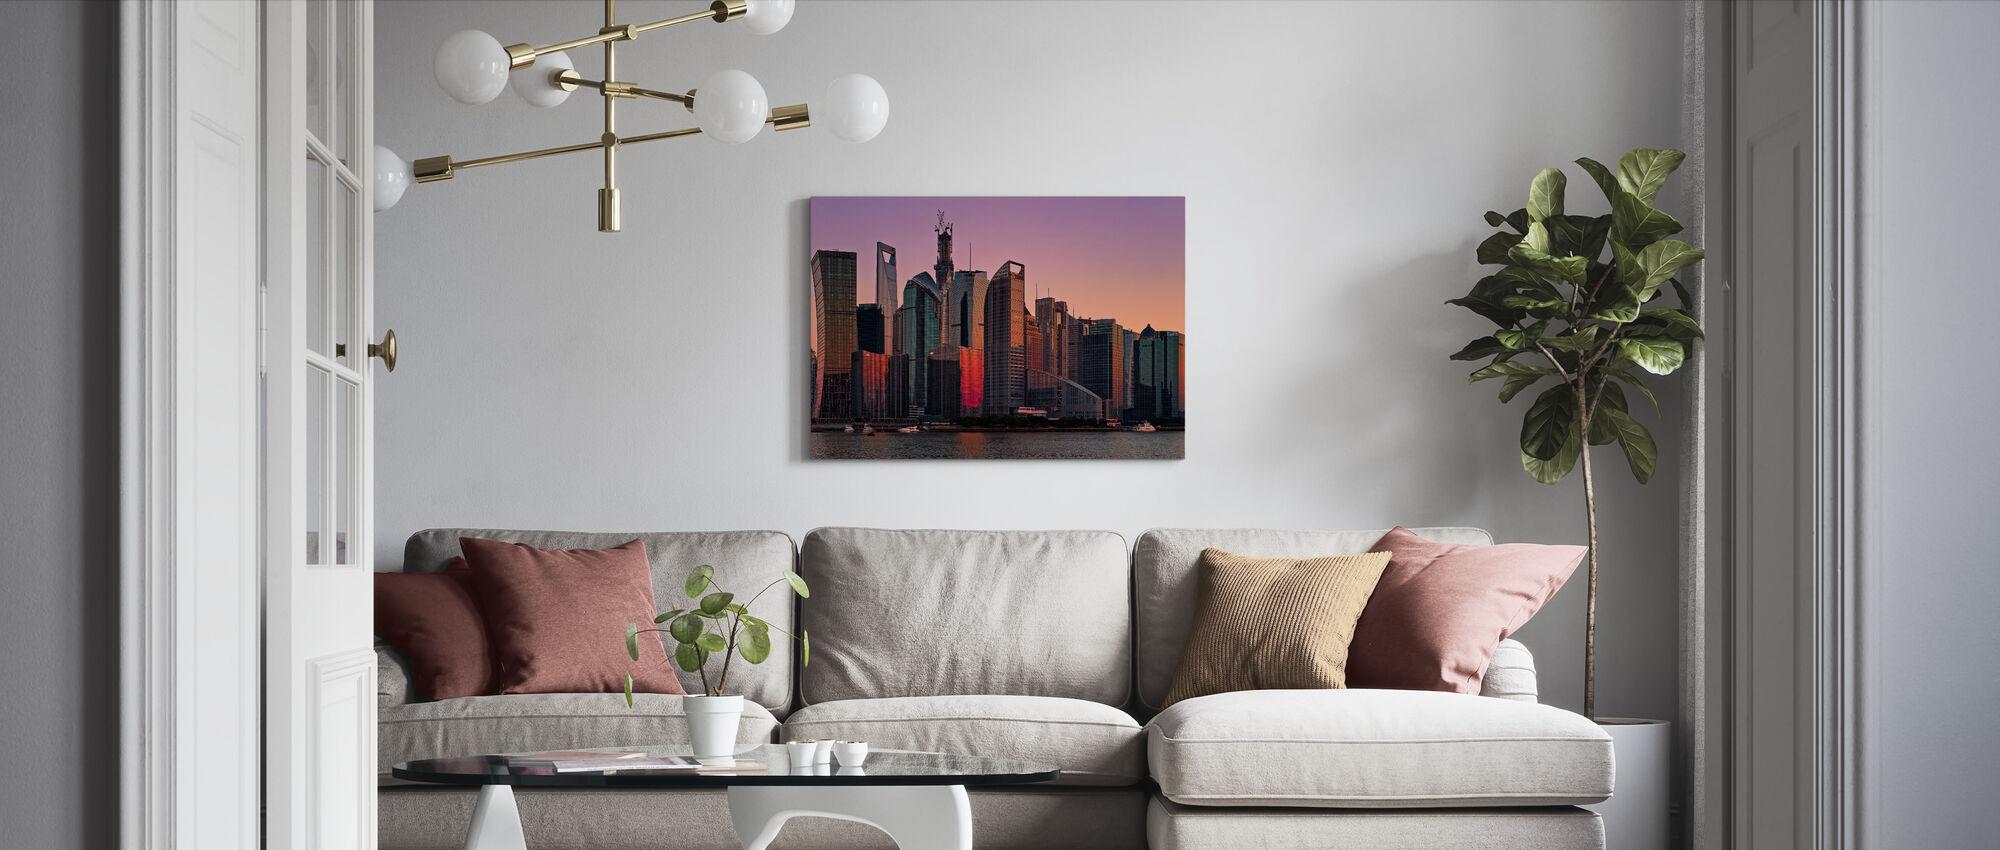 Sundown on Shanghai - Canvas print - Living Room